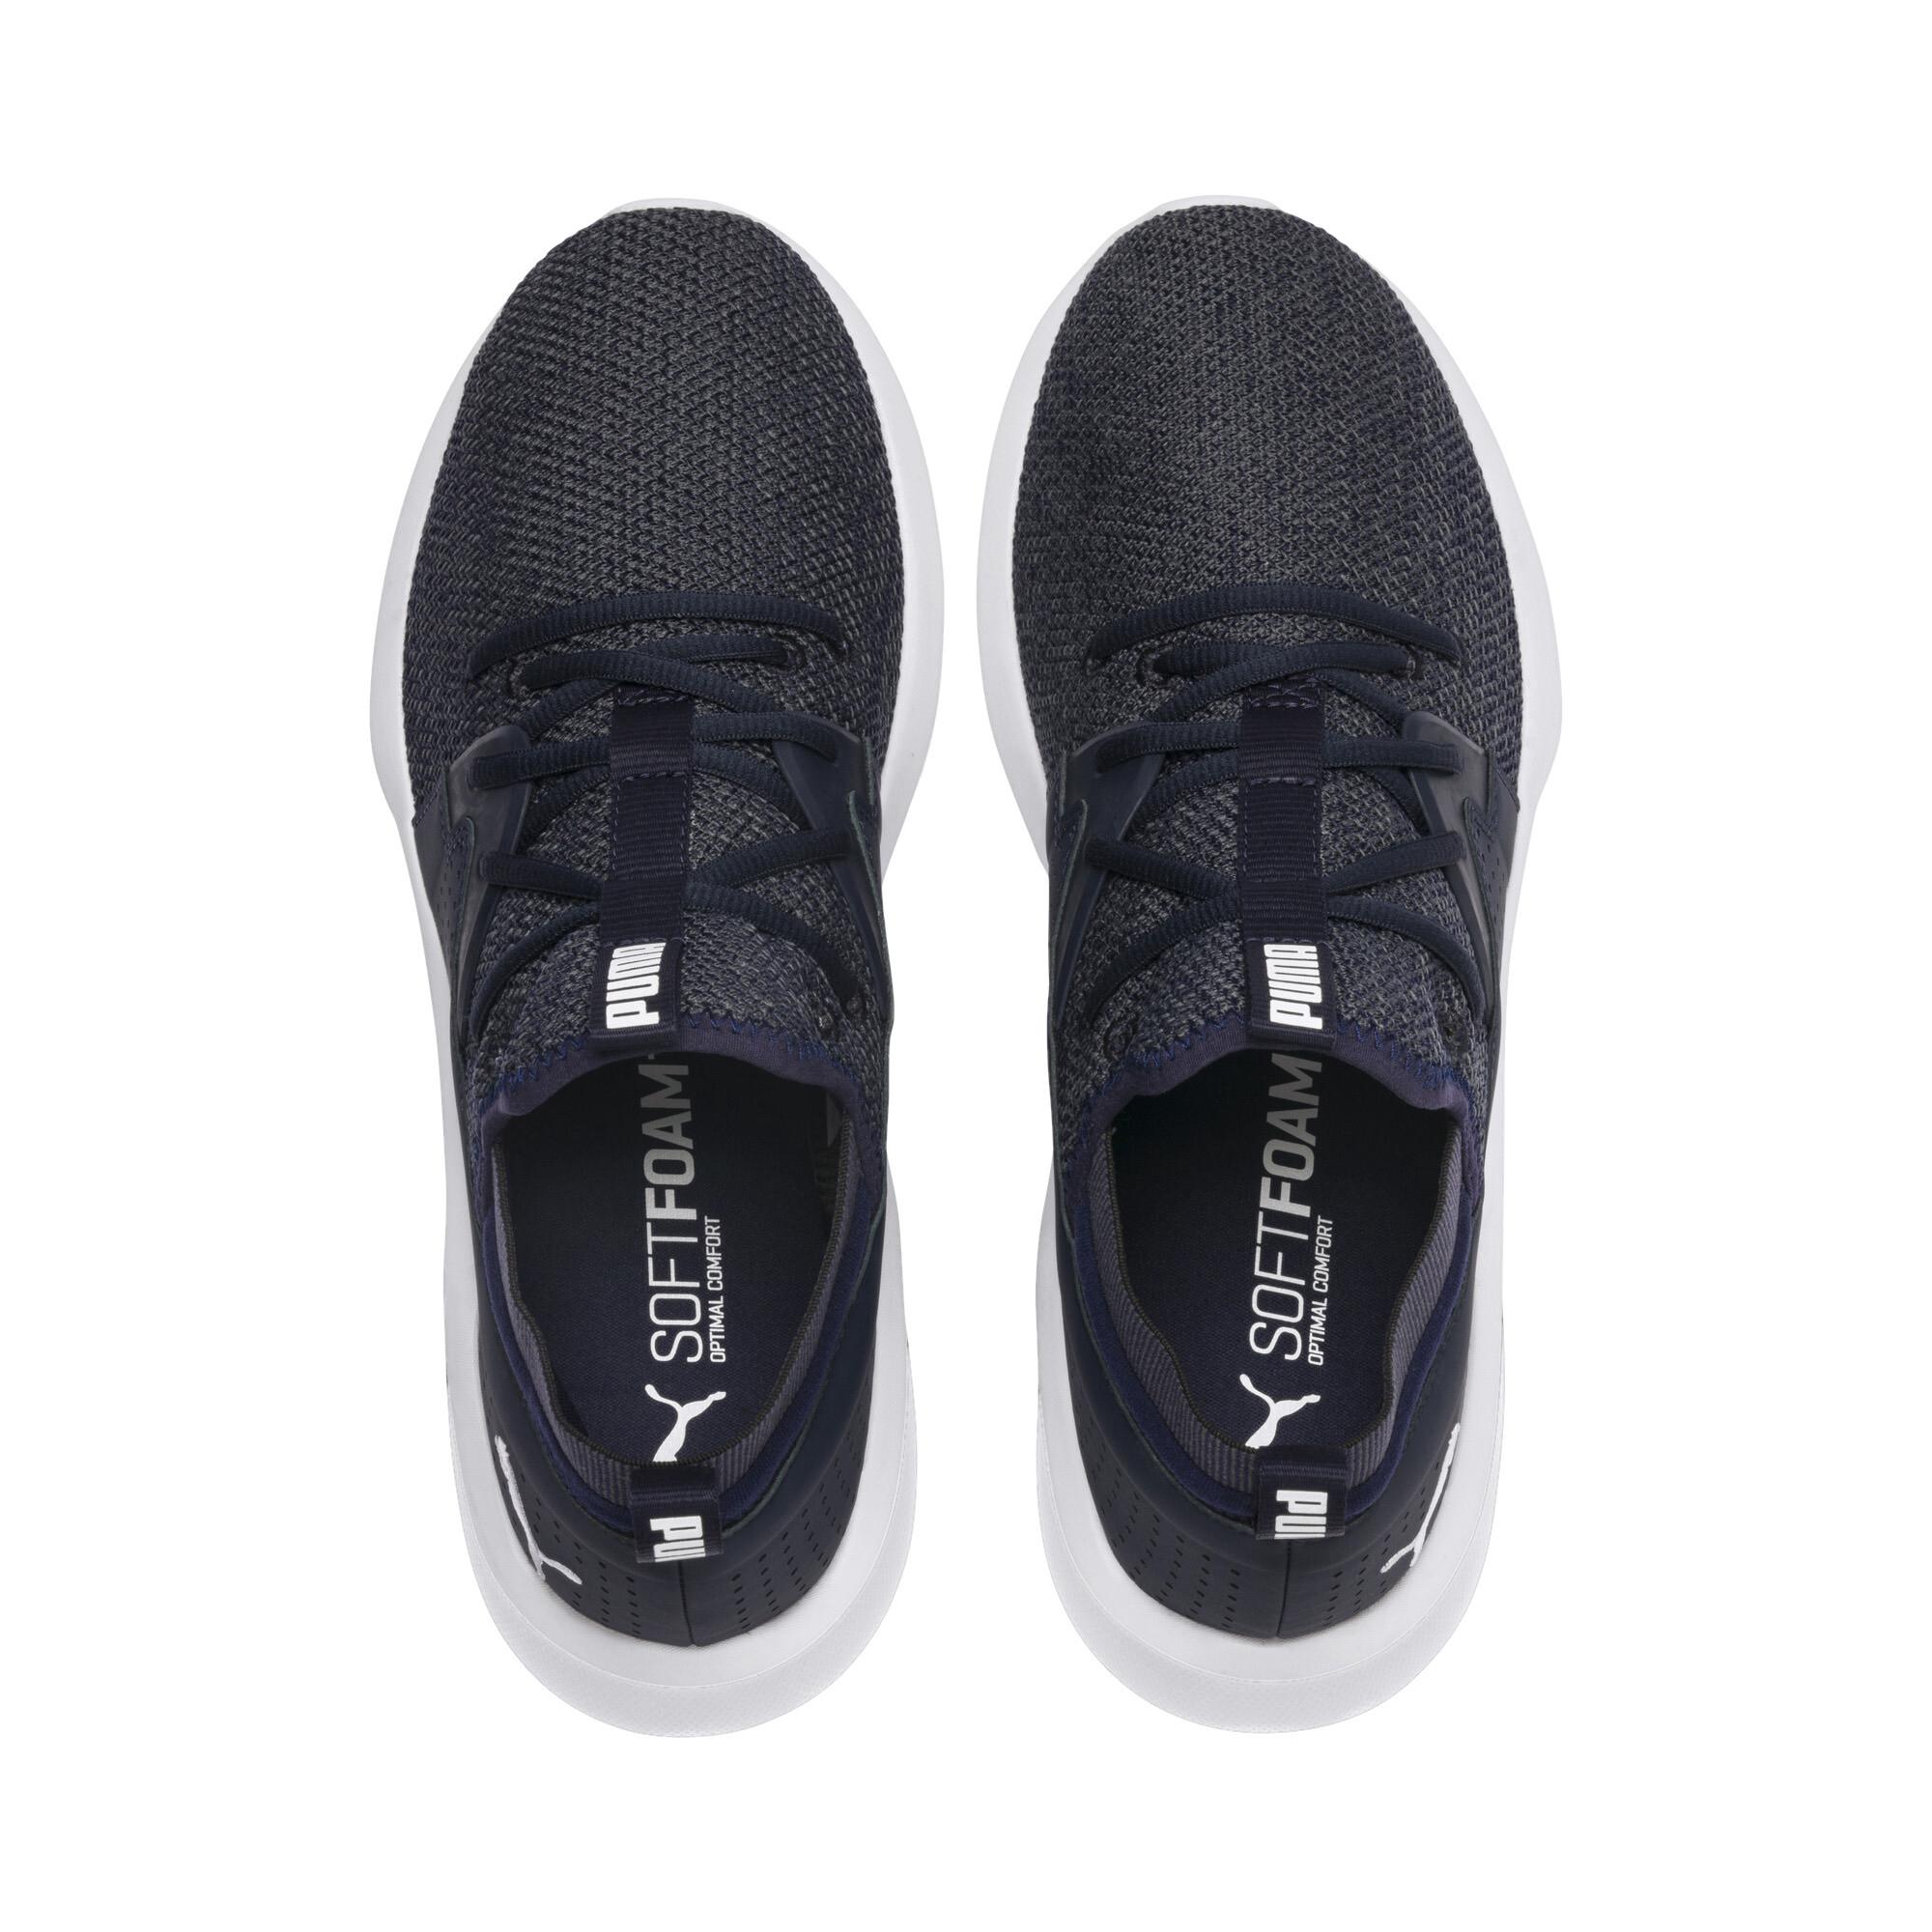 PUMA-Emergence-Men-039-s-Sneakers-Men-Shoe-Running thumbnail 13